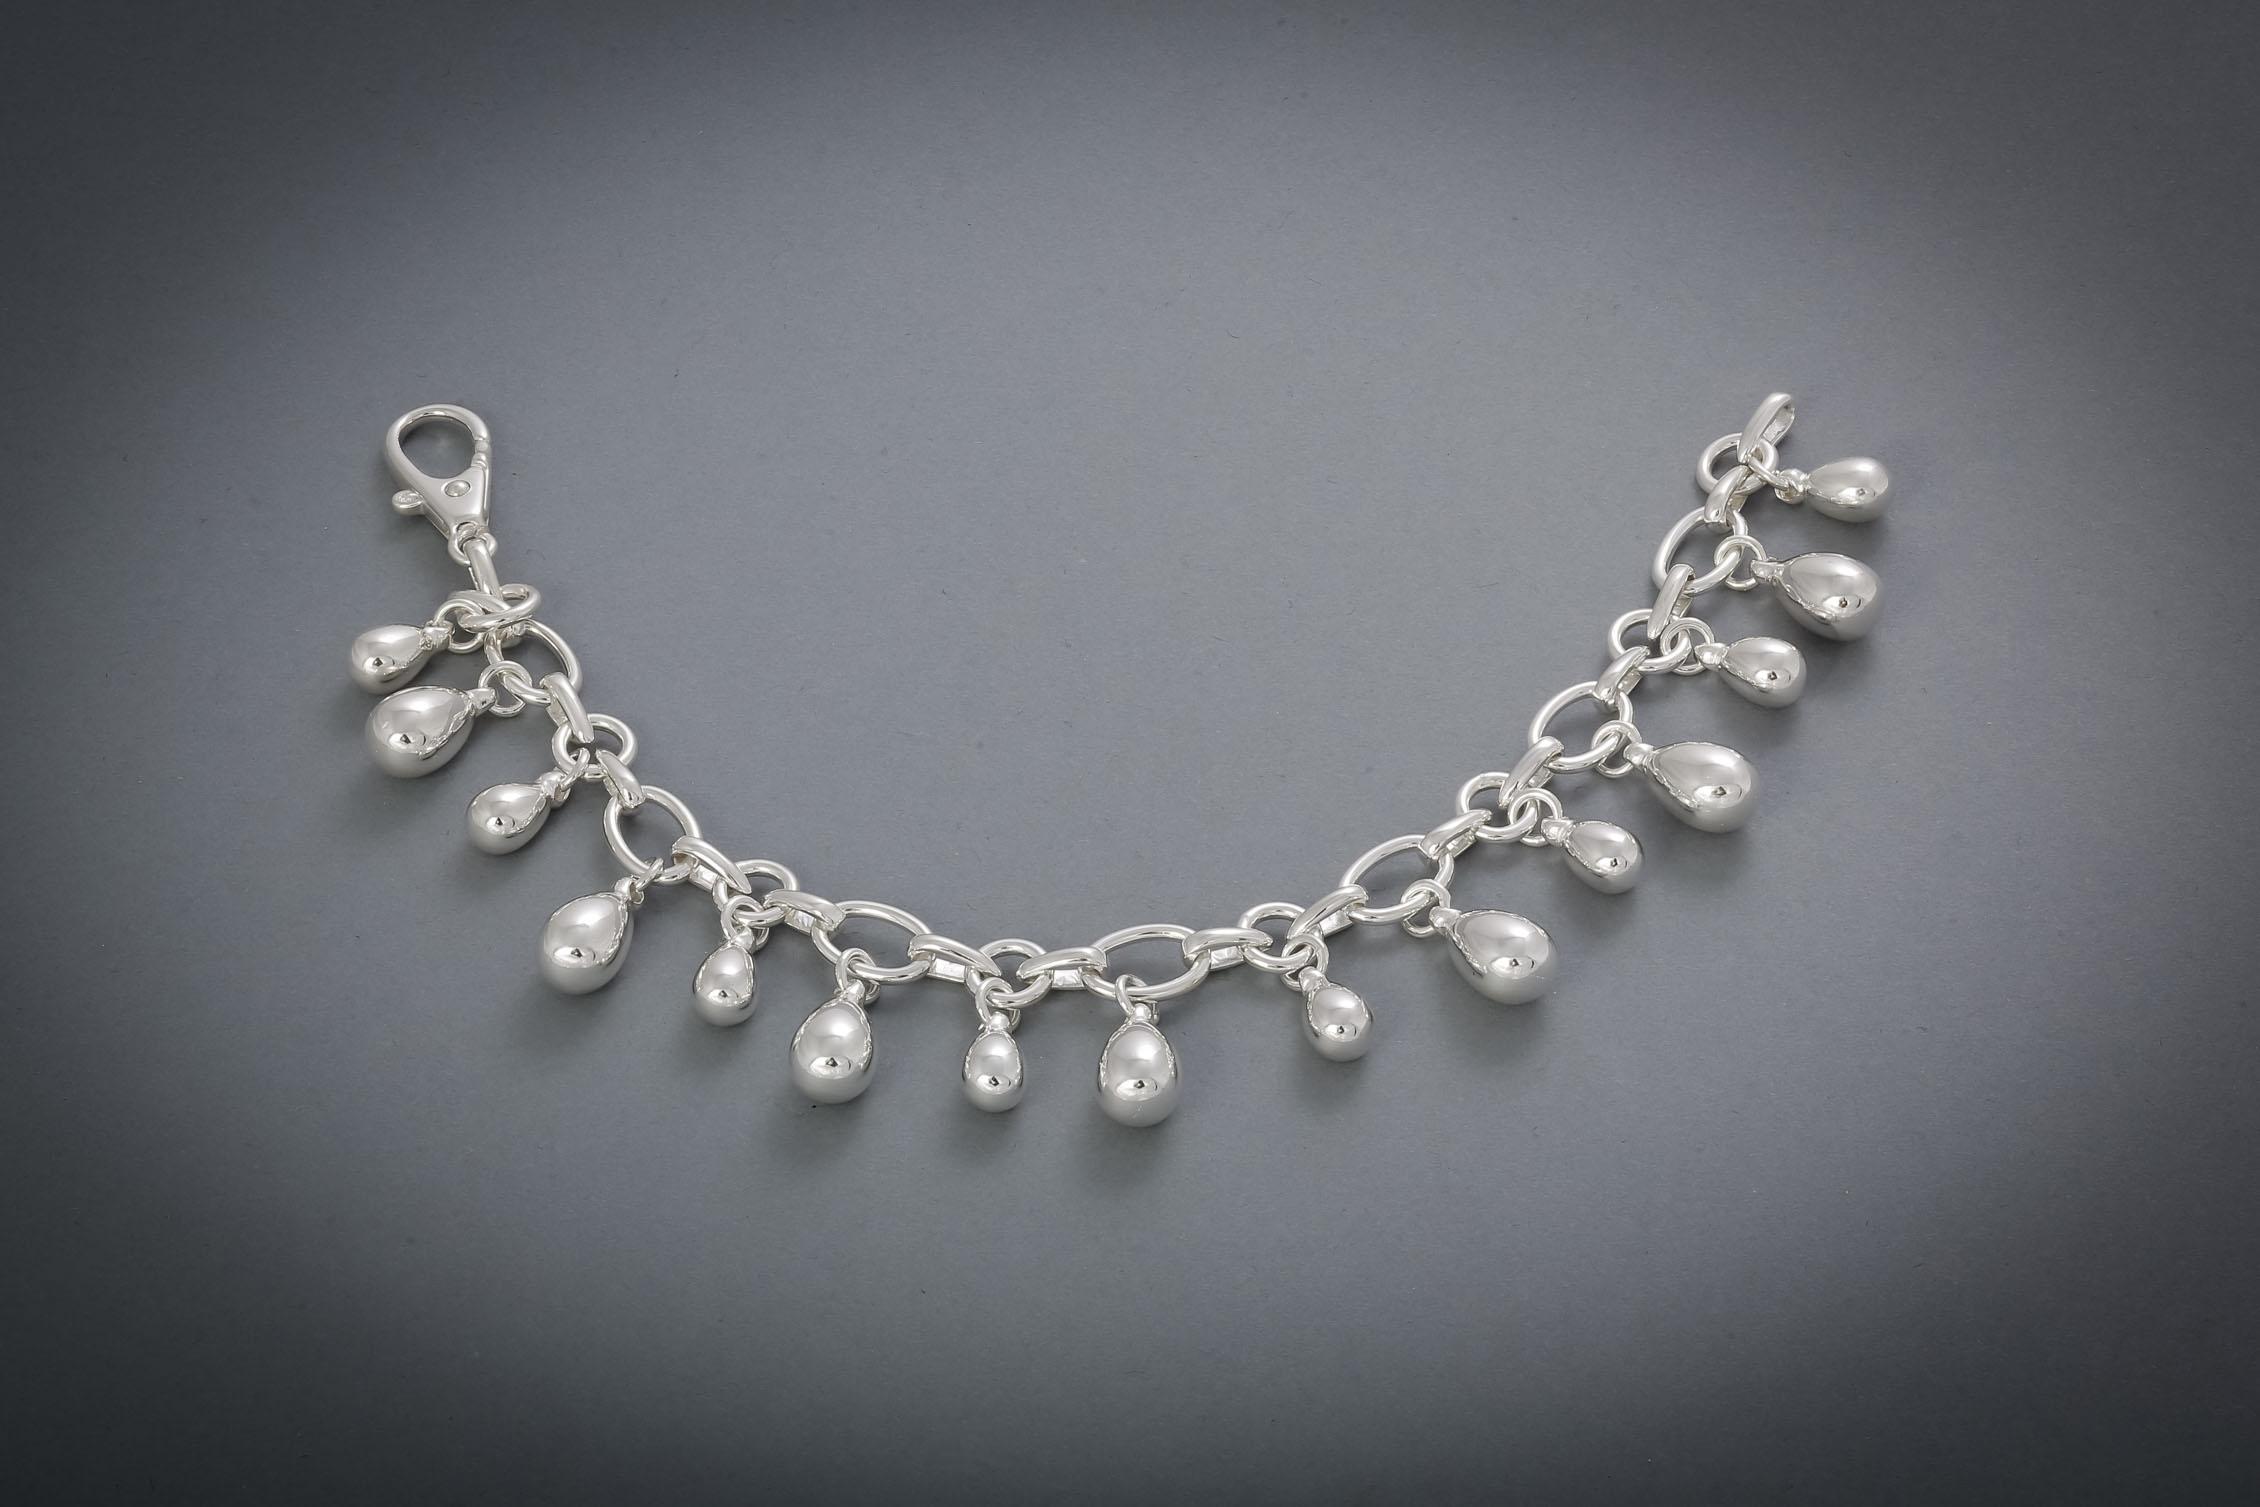 069 Silberarmband, Tropfen € 138,-